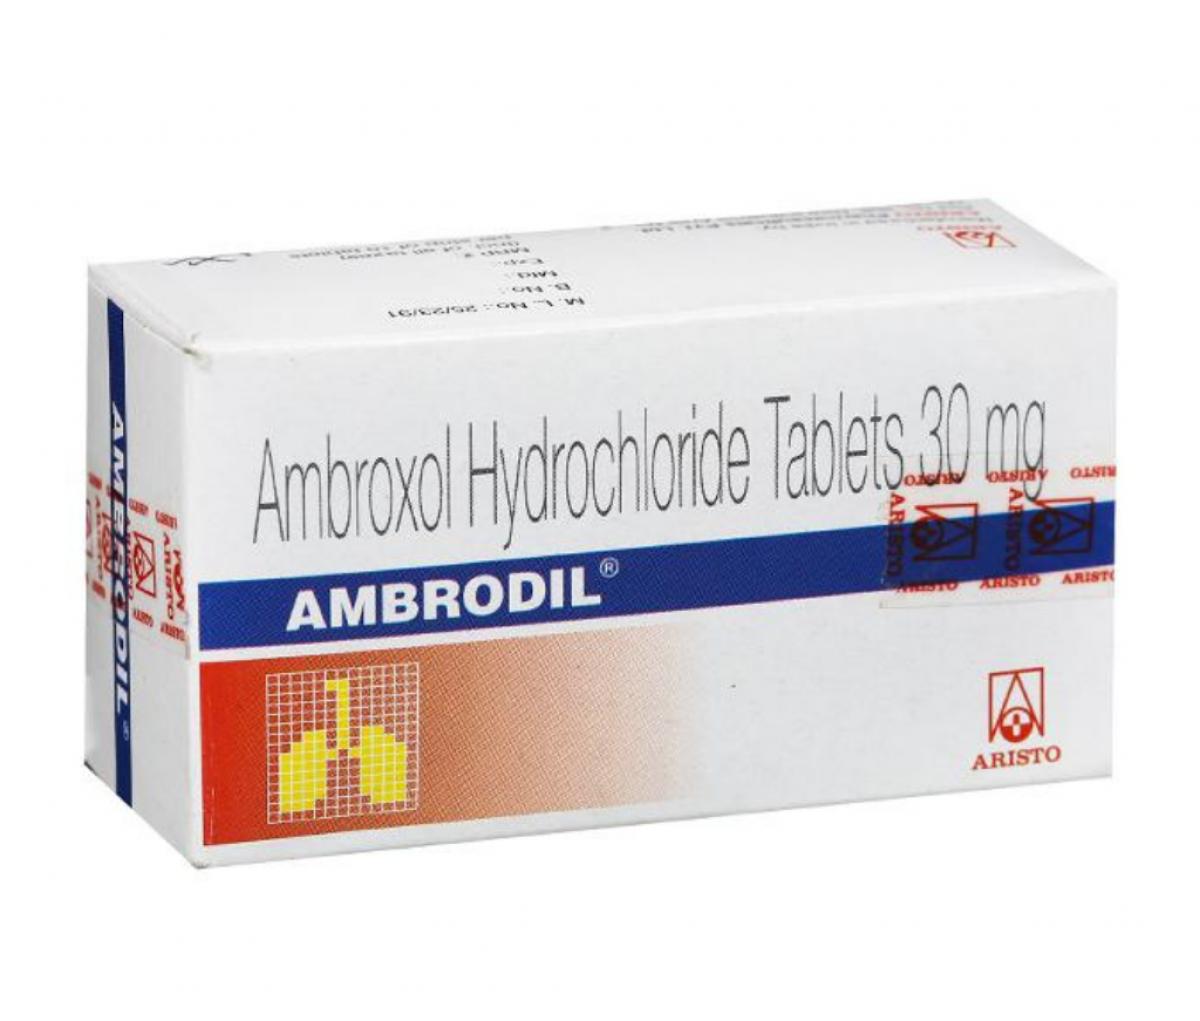 Ambrodil 30mg IP Tablet